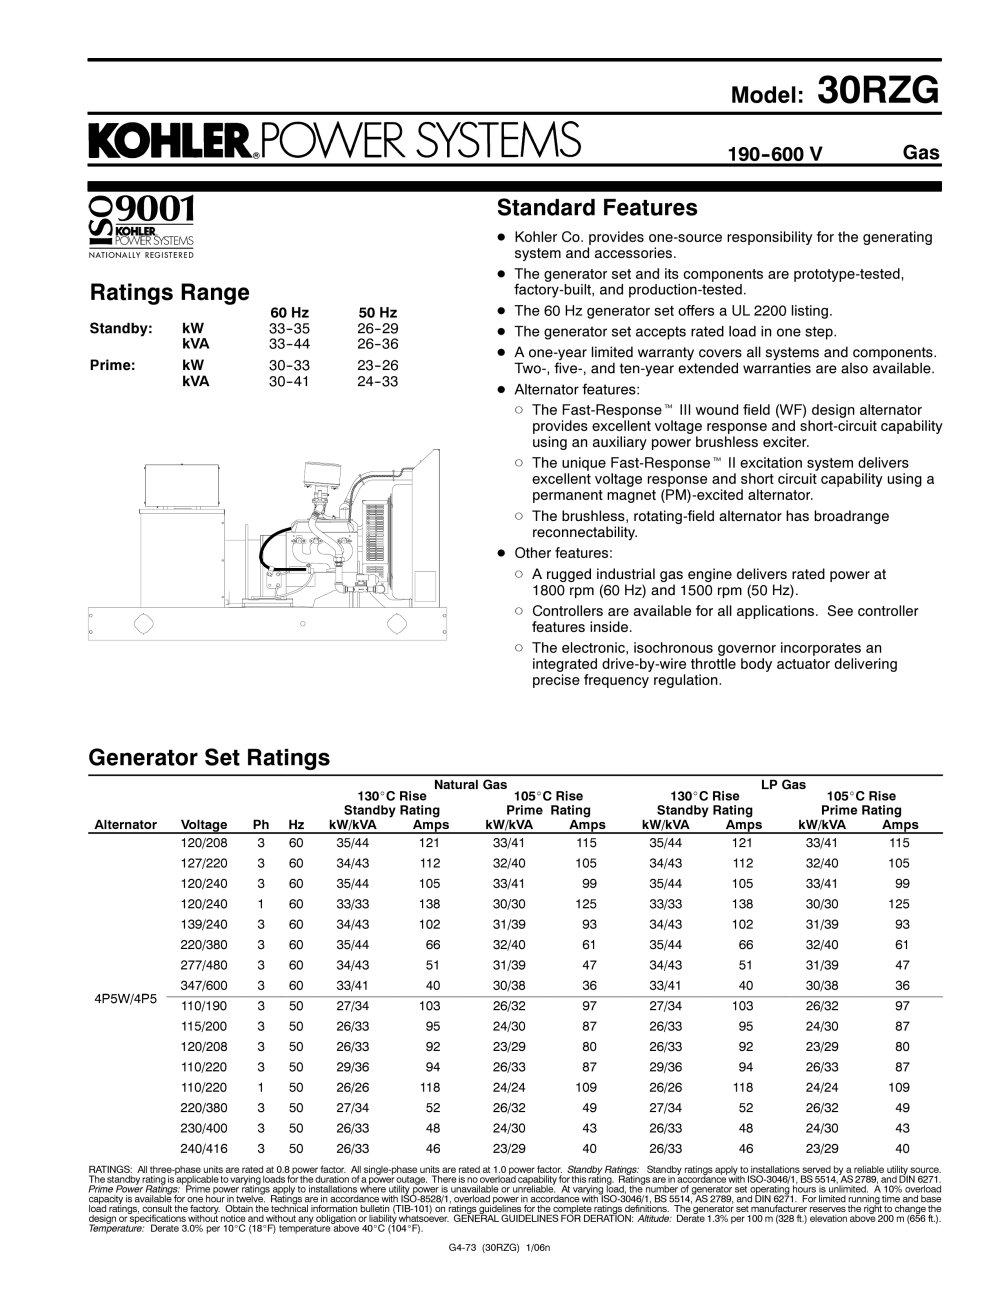 gas generators 30rzg 70589_1b?resize\\=665%2C861 diagrams 997759 kohler ignition wiring diagram kohler engine  at virtualis.co